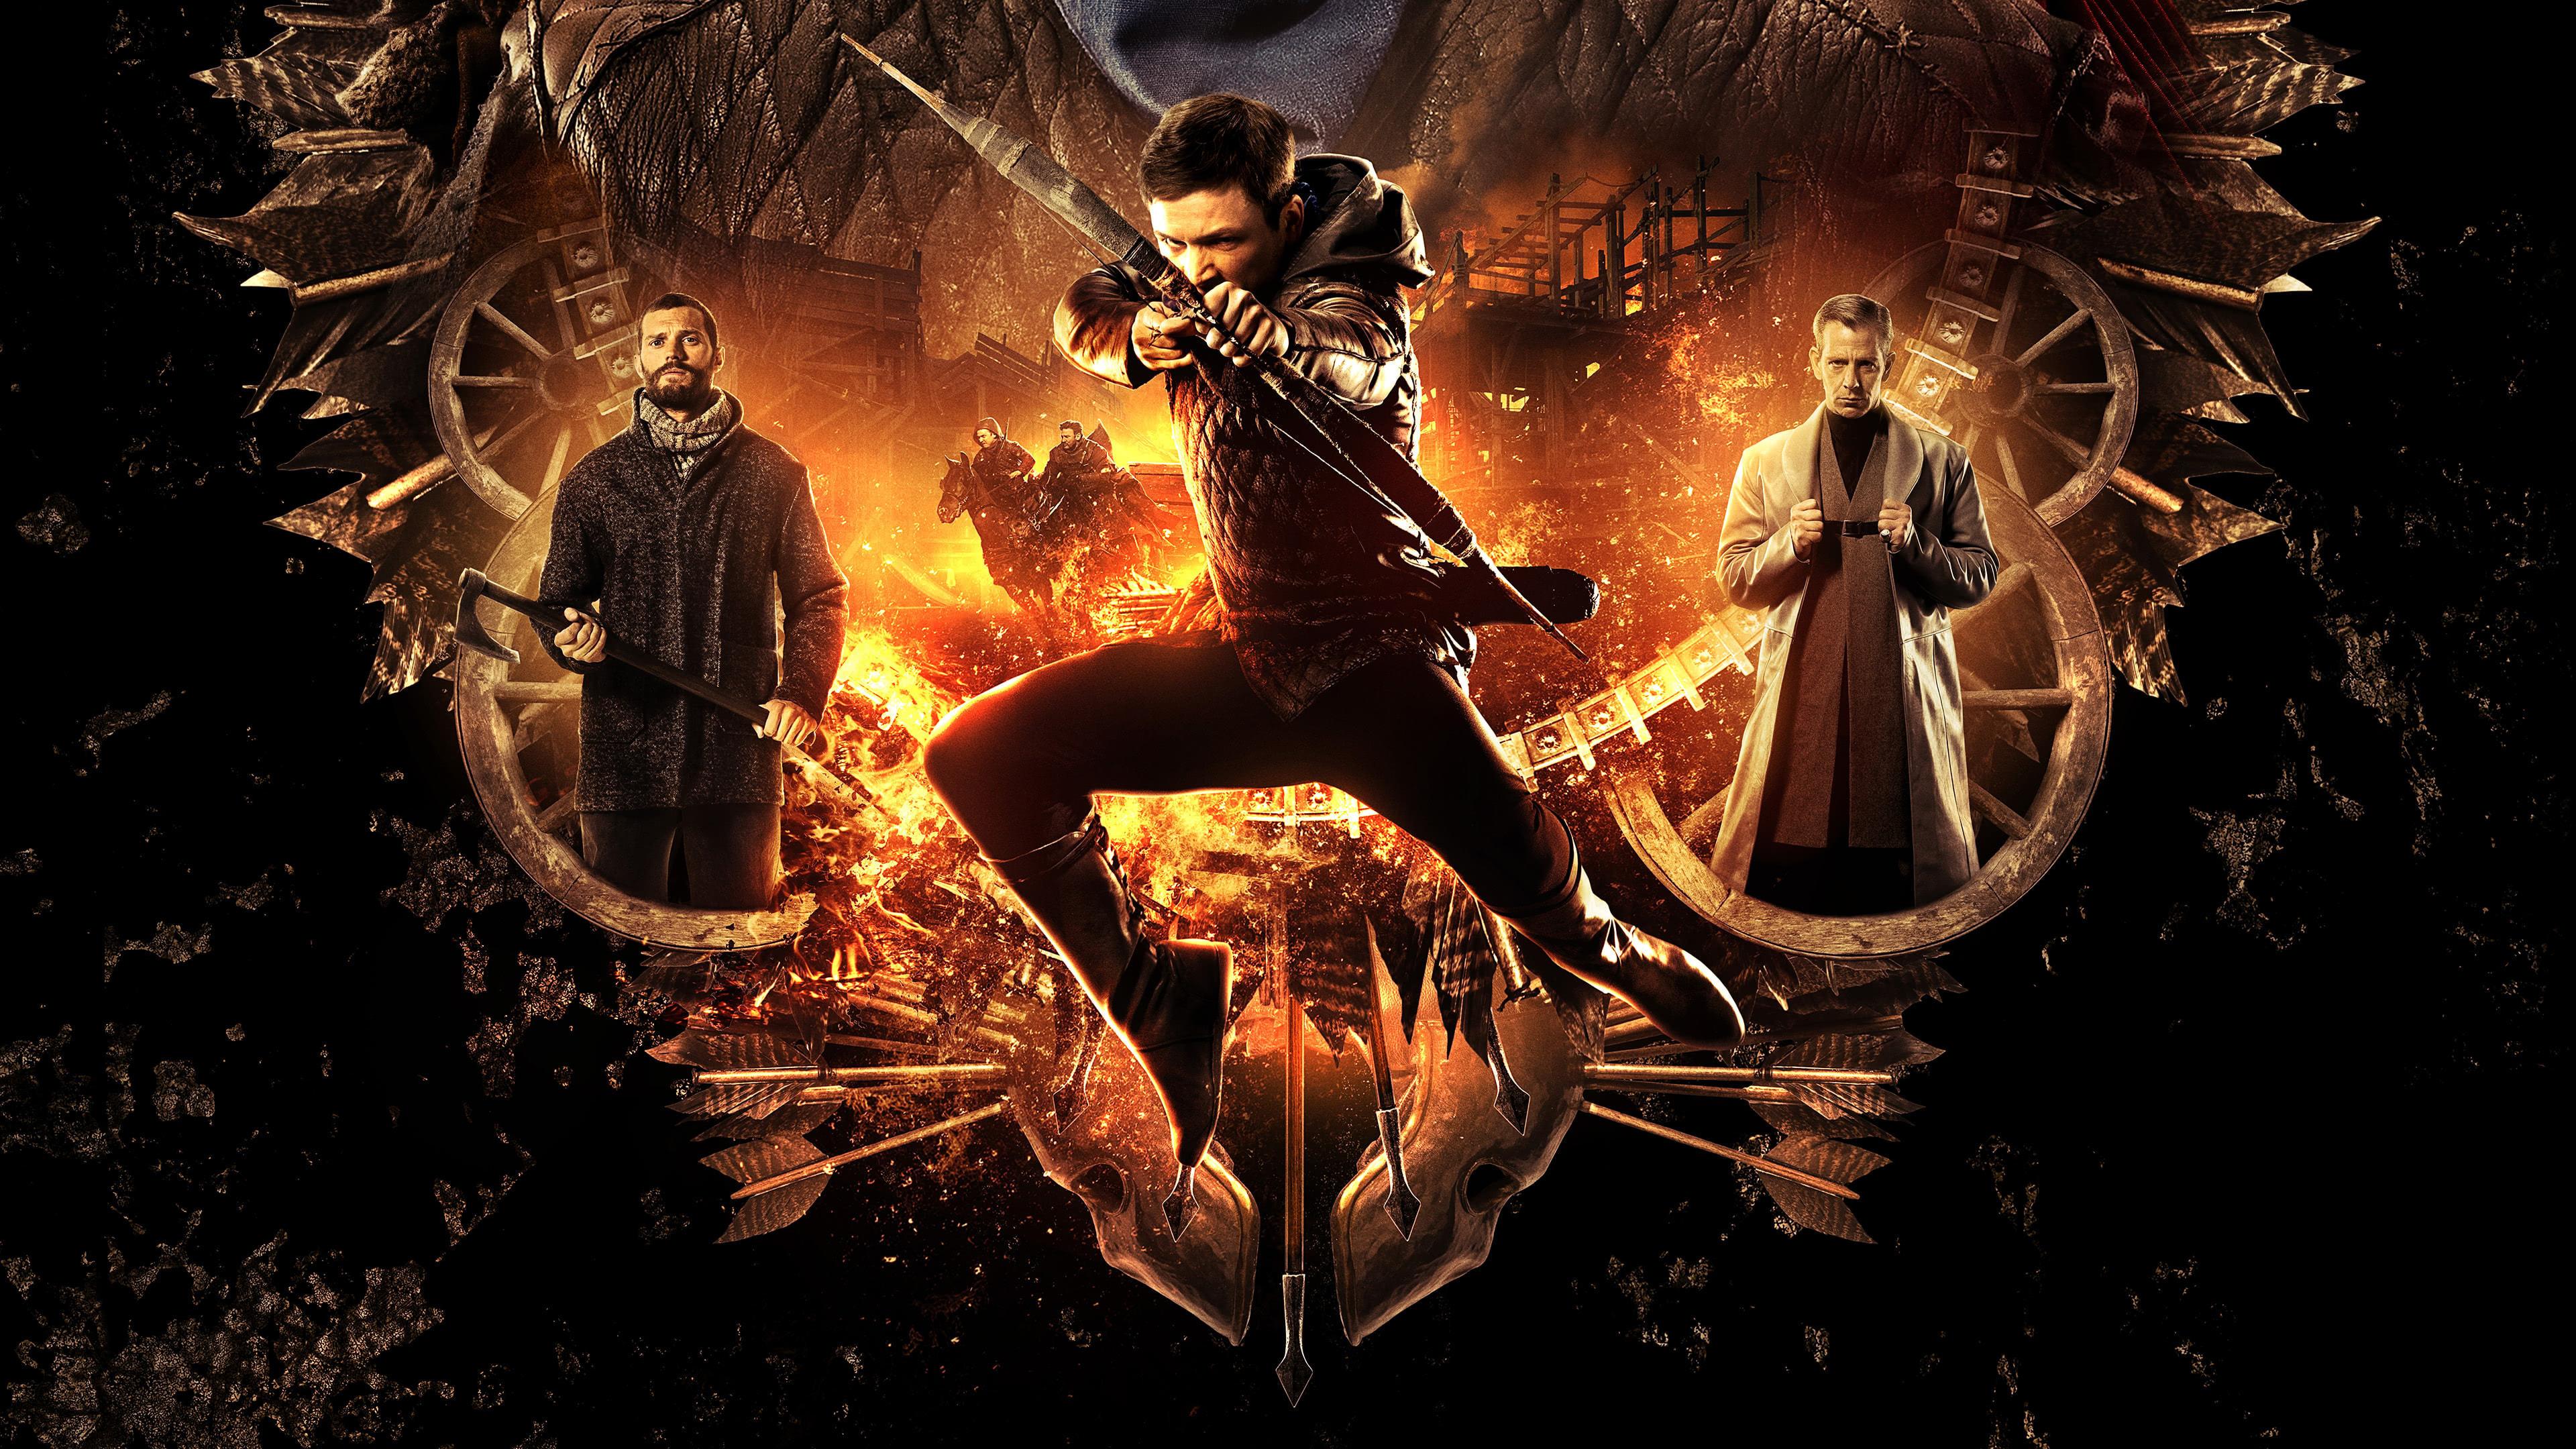 Robin Hood Movie Uhd 4k Wallpaper Pixelz